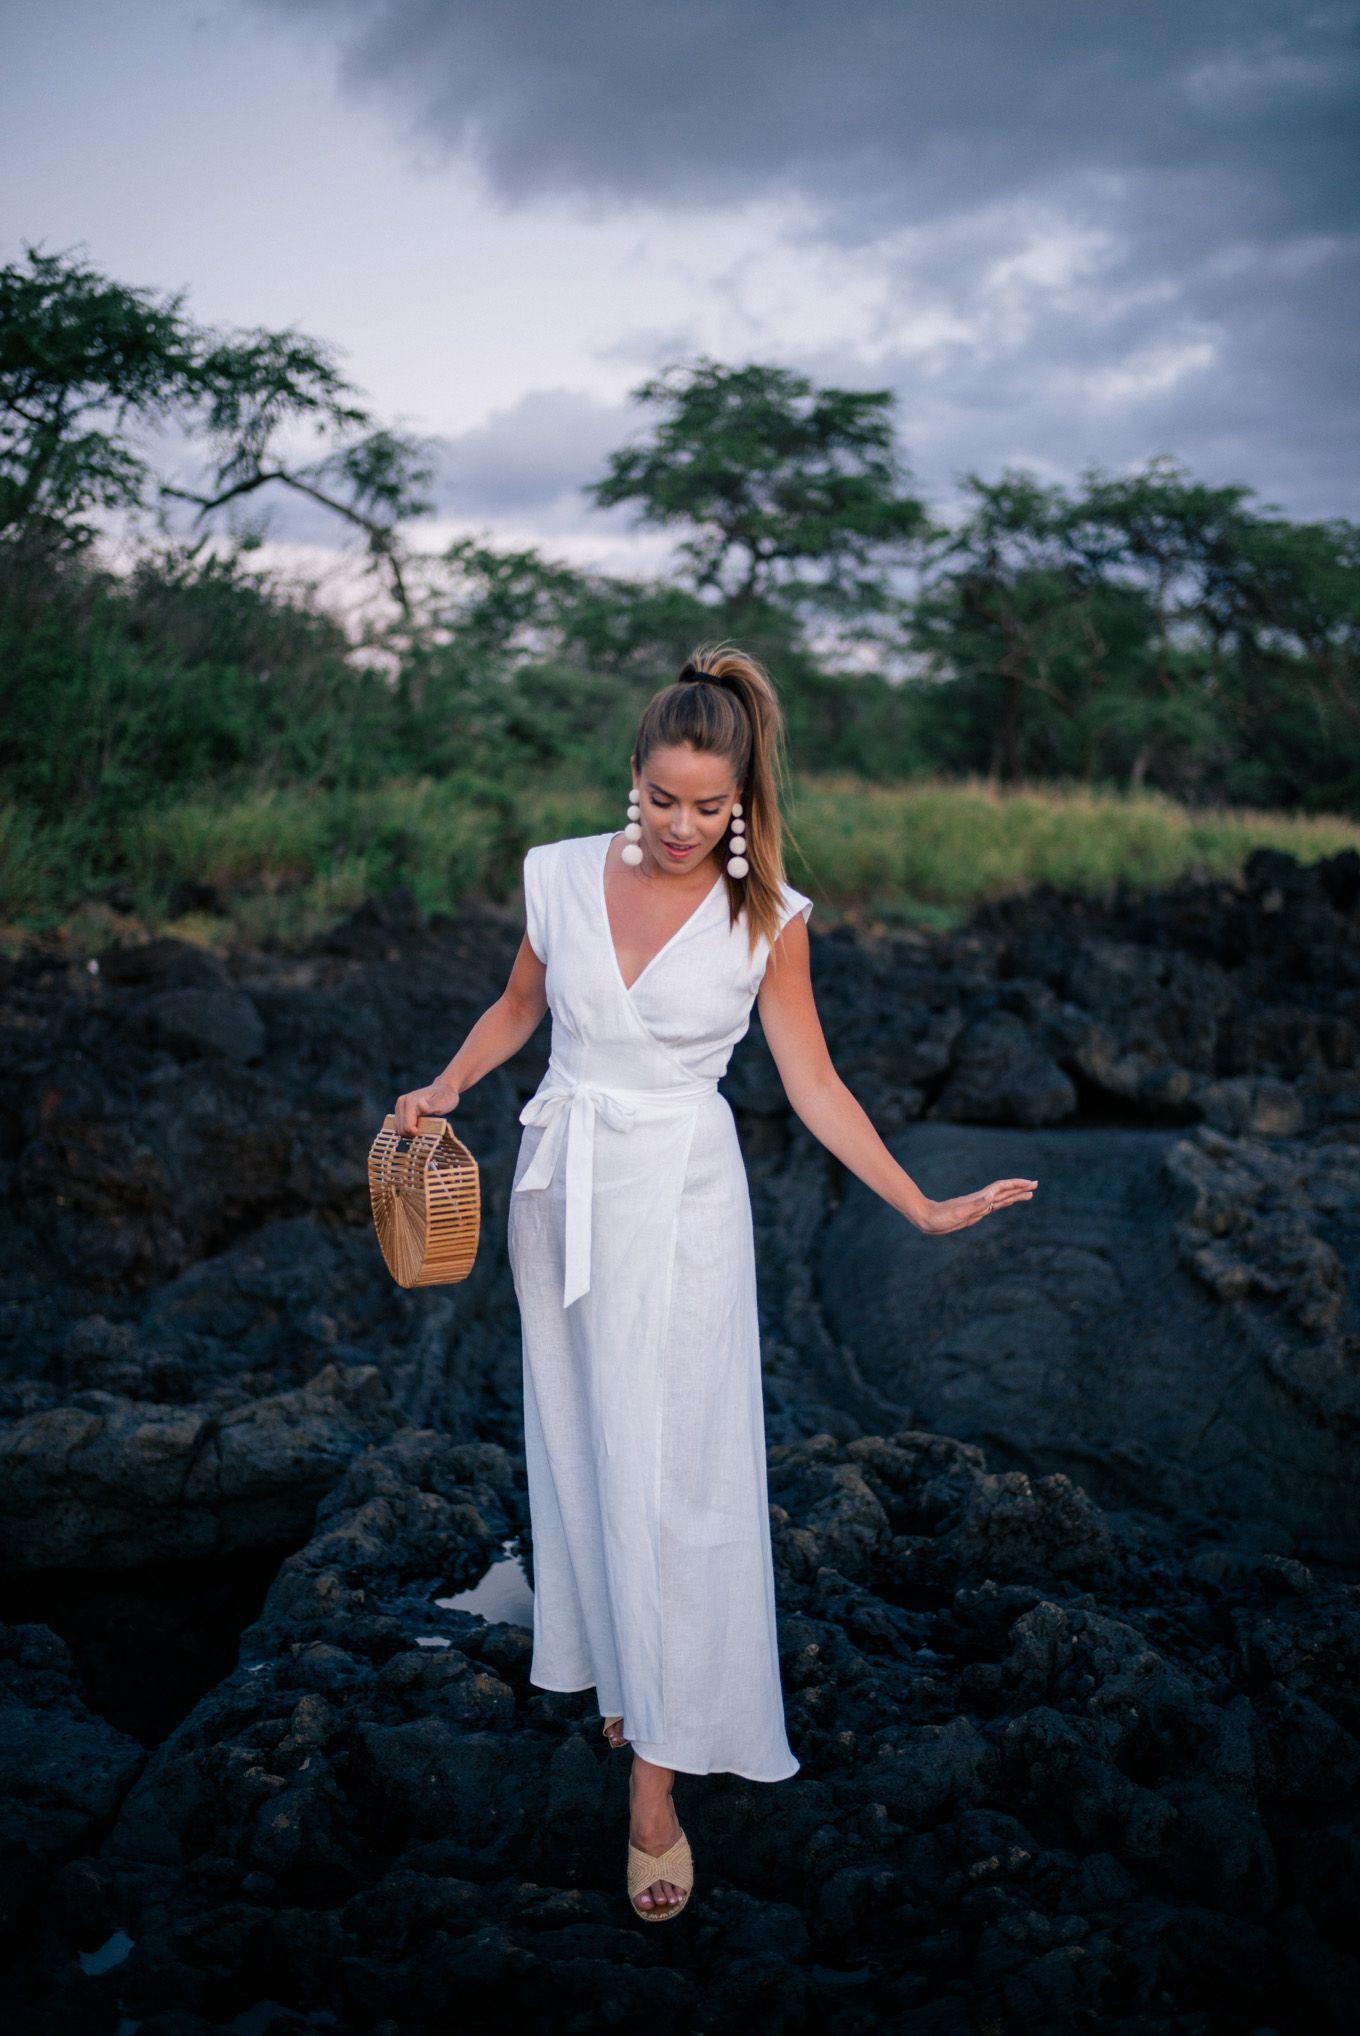 b36efb0ffb72 Gal Meets Glam White Linen Maxi Dress - Reformation dress